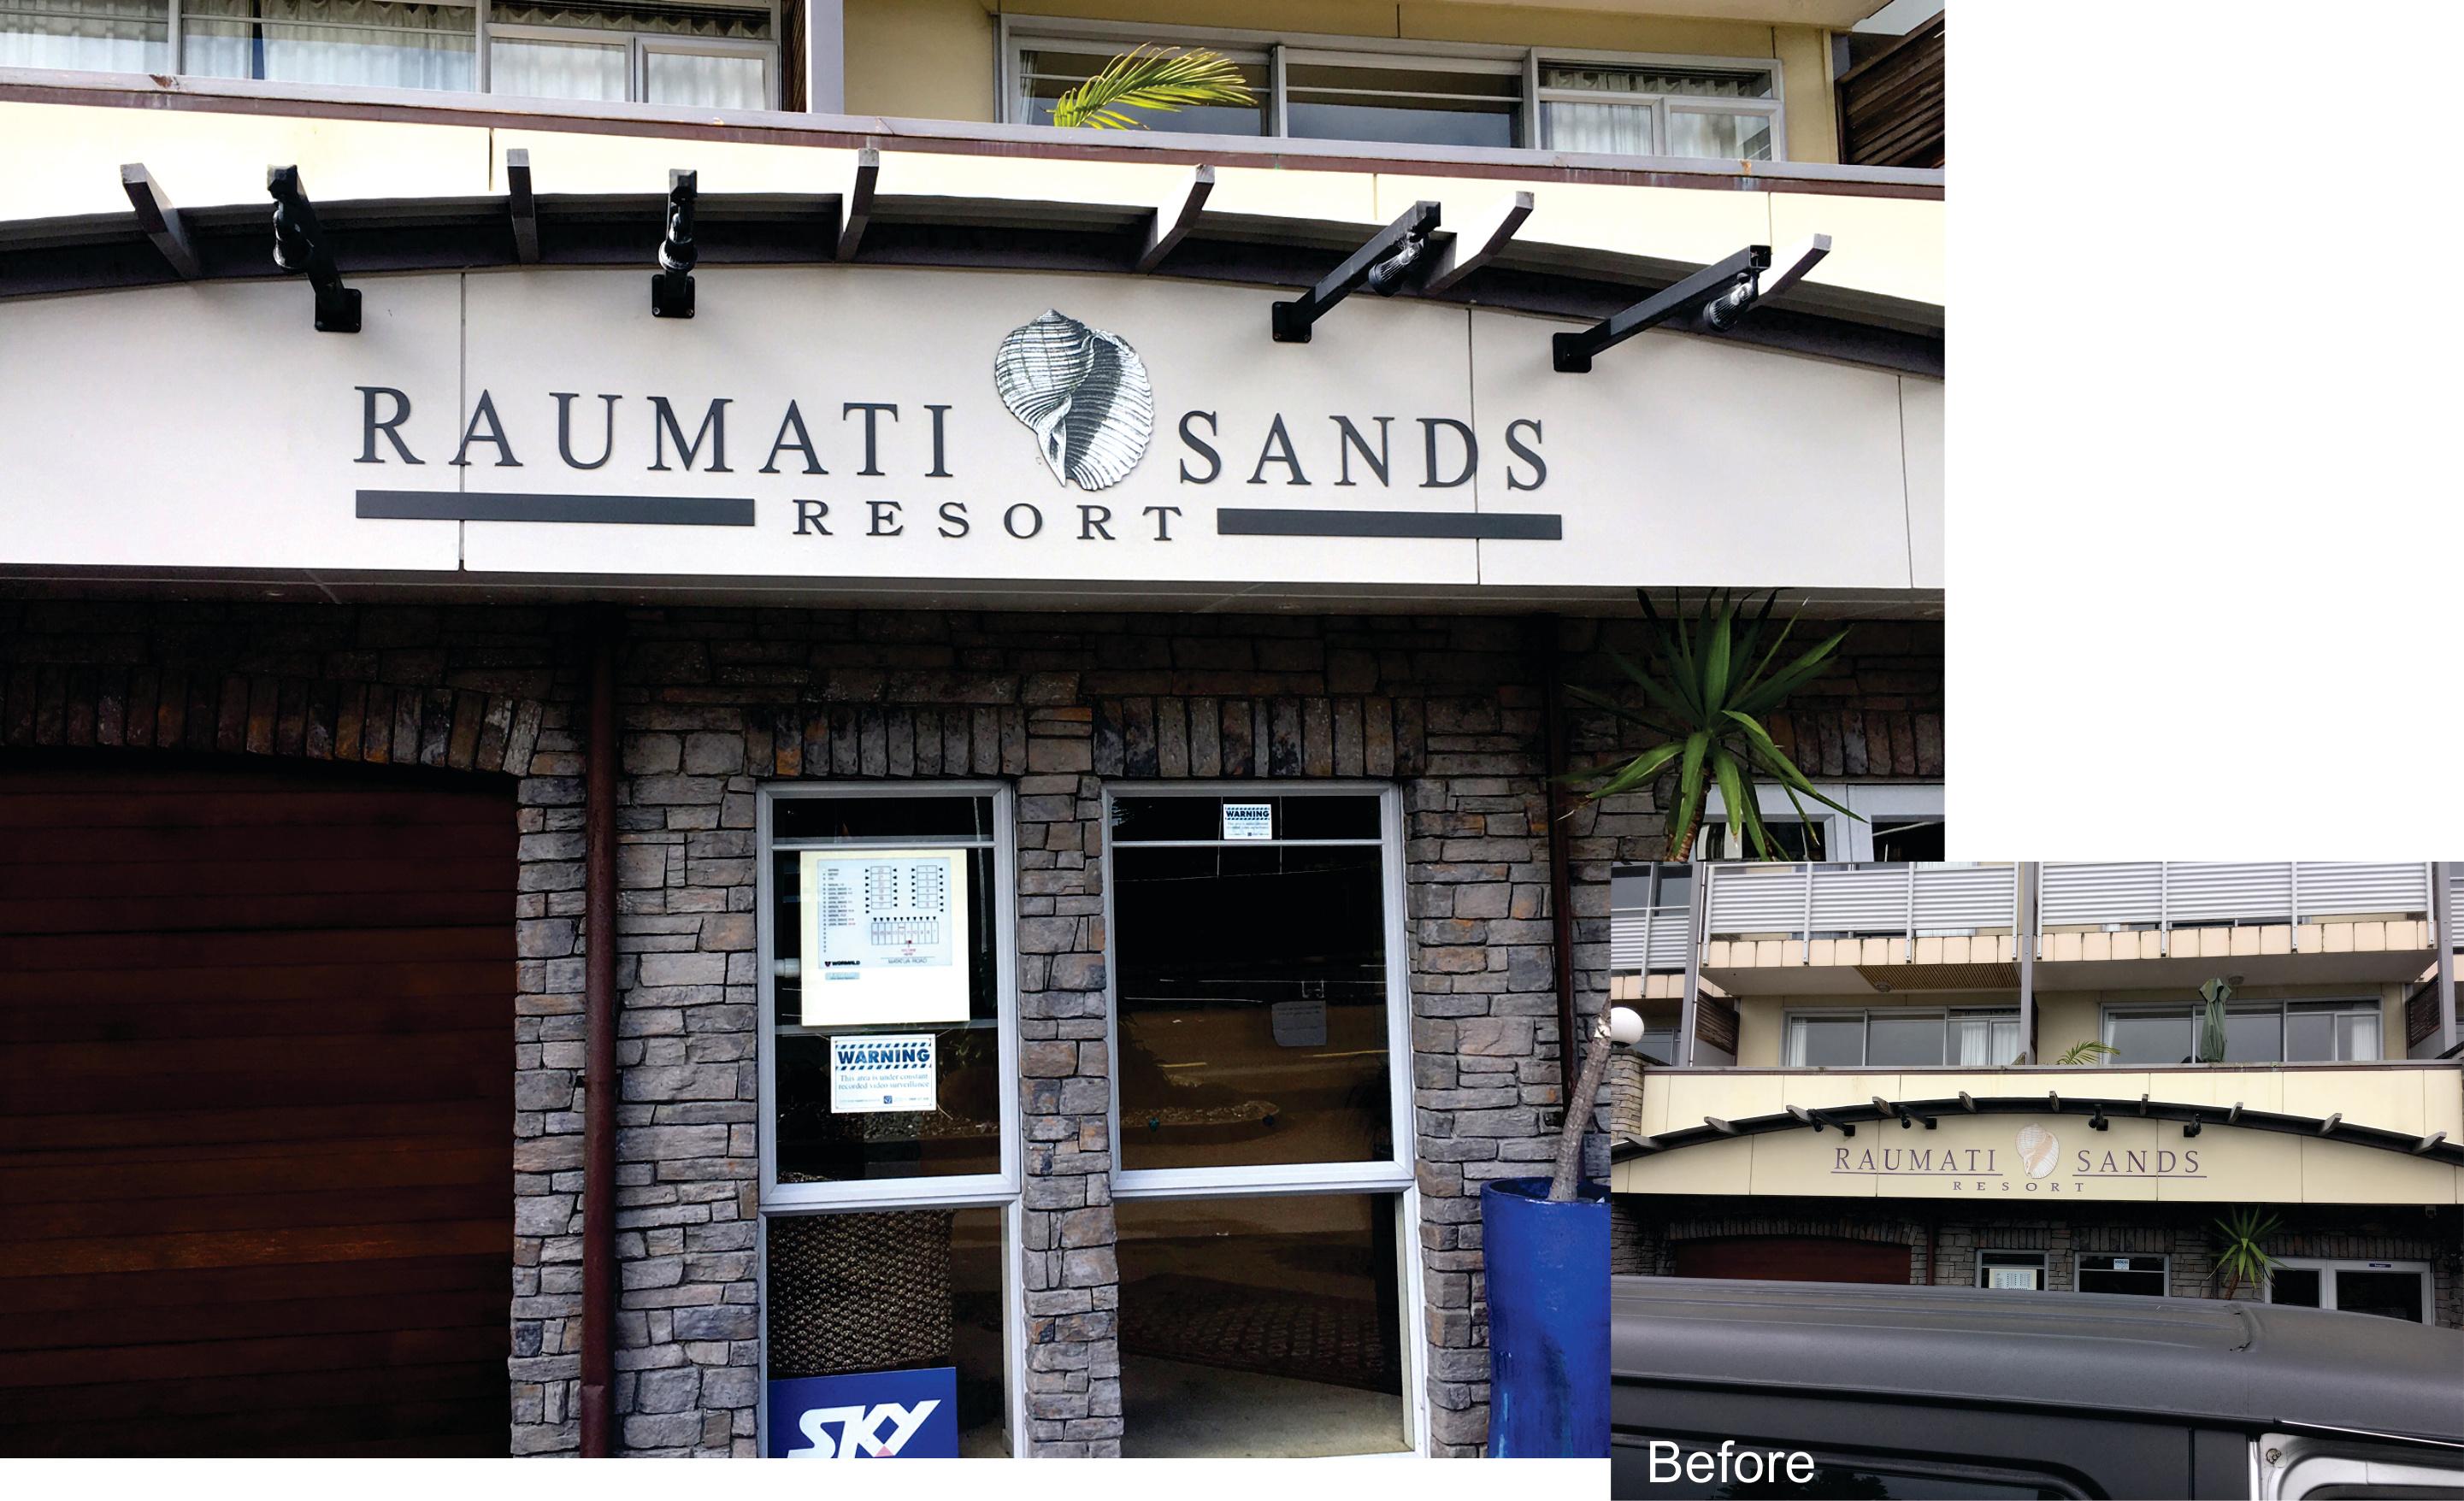 Raumati Sands Resort